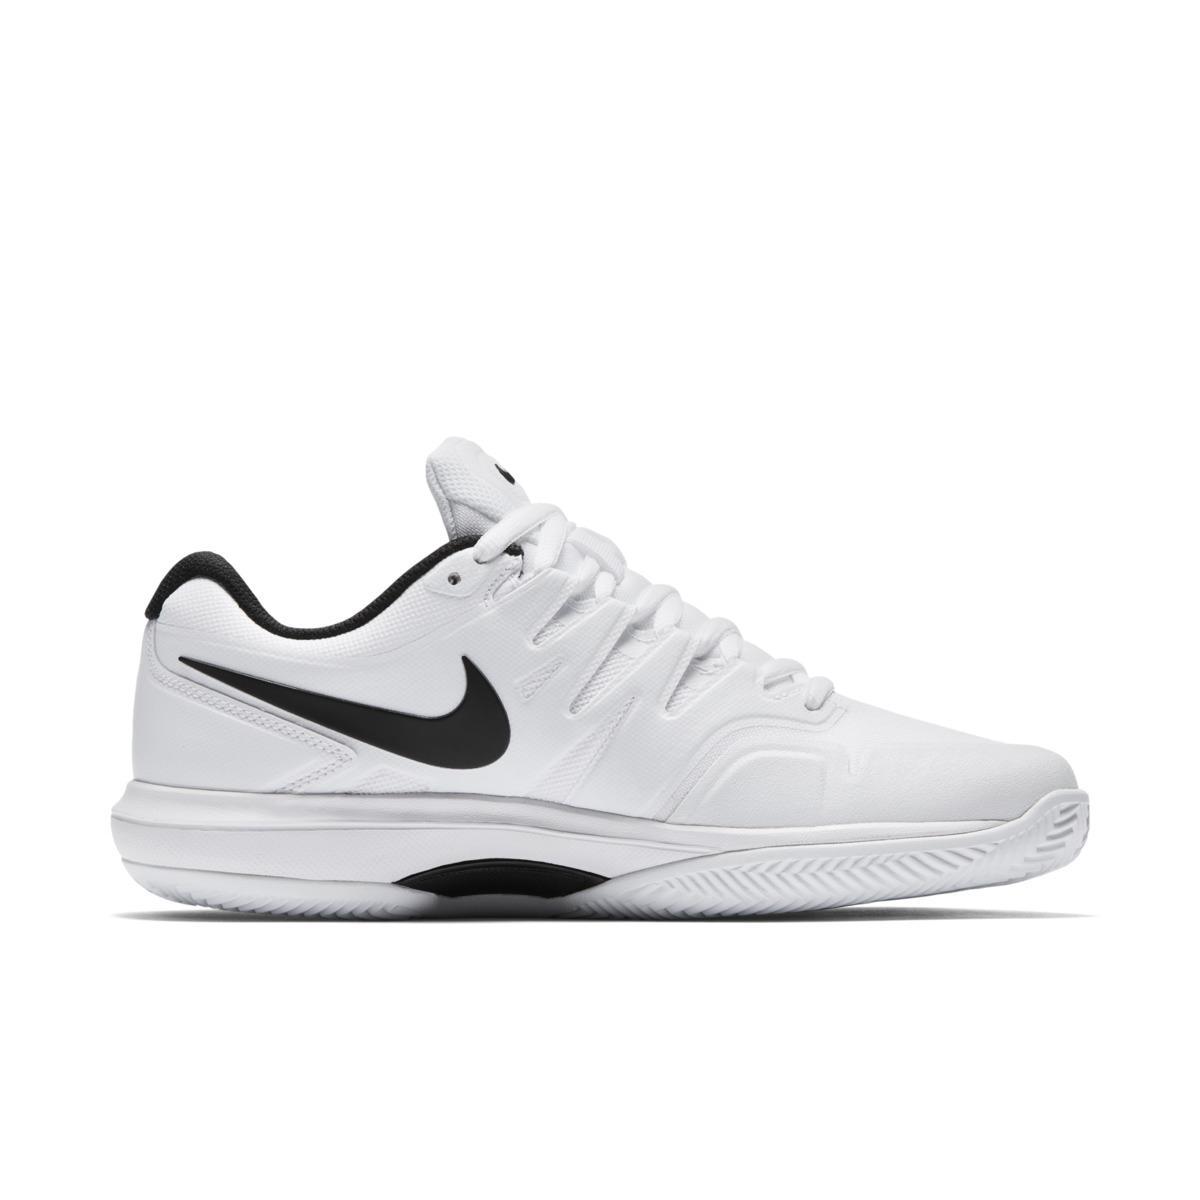 b70b51f12028 Nike Air Zoom Prestige Hc Men s Tennis Shoe in White for Men - Lyst